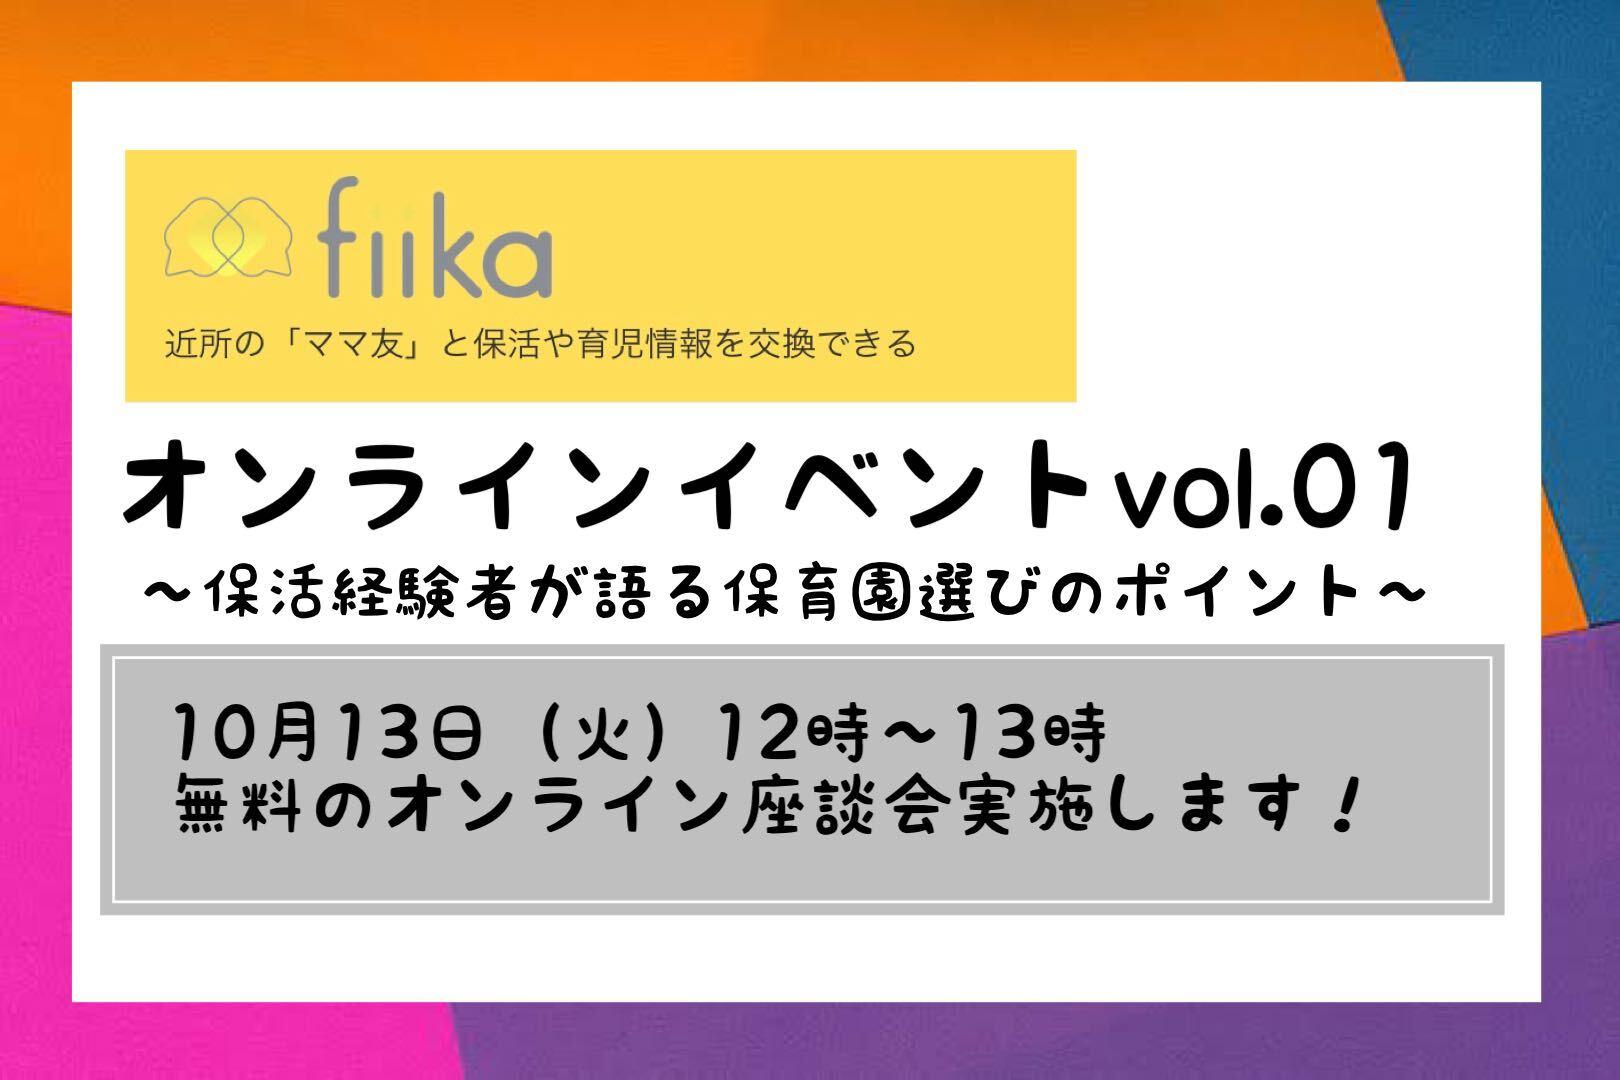 Fiikaオンライン座談会イベント:保活経験者が語る保育園選びのポイント